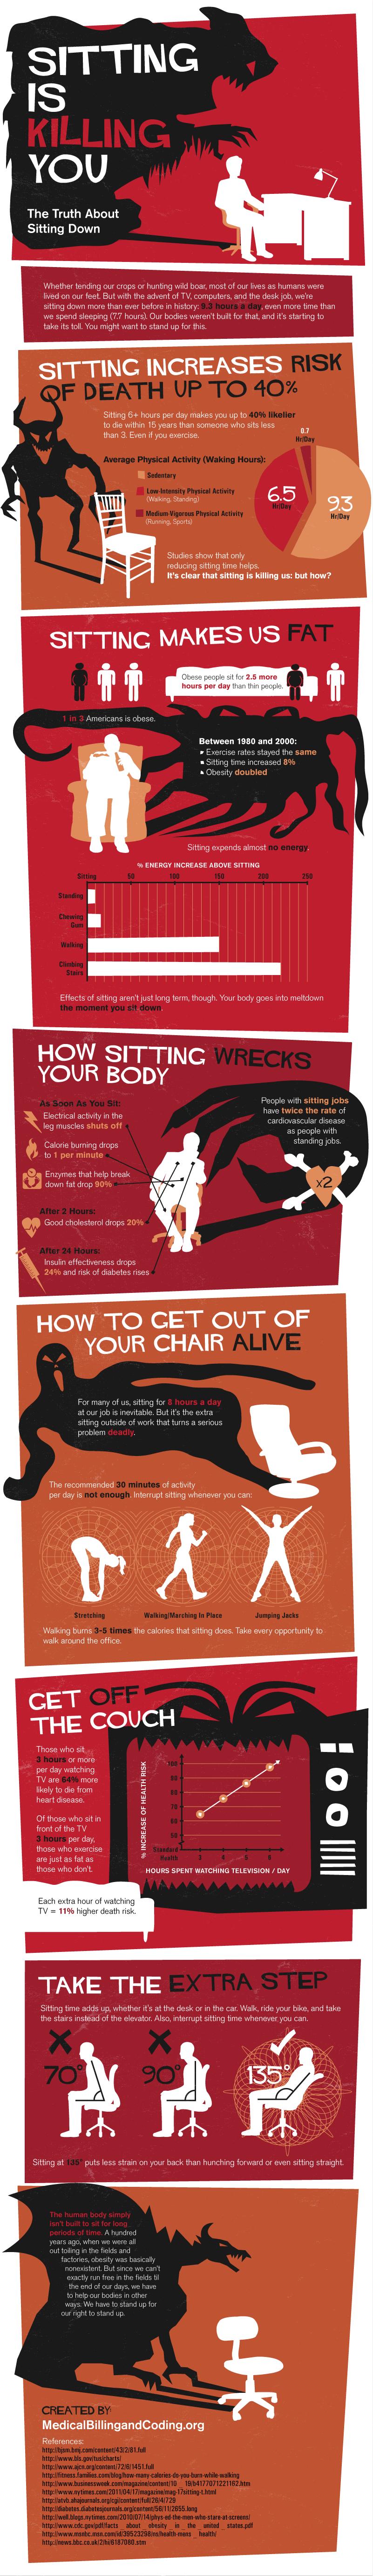 sitzen macht krank